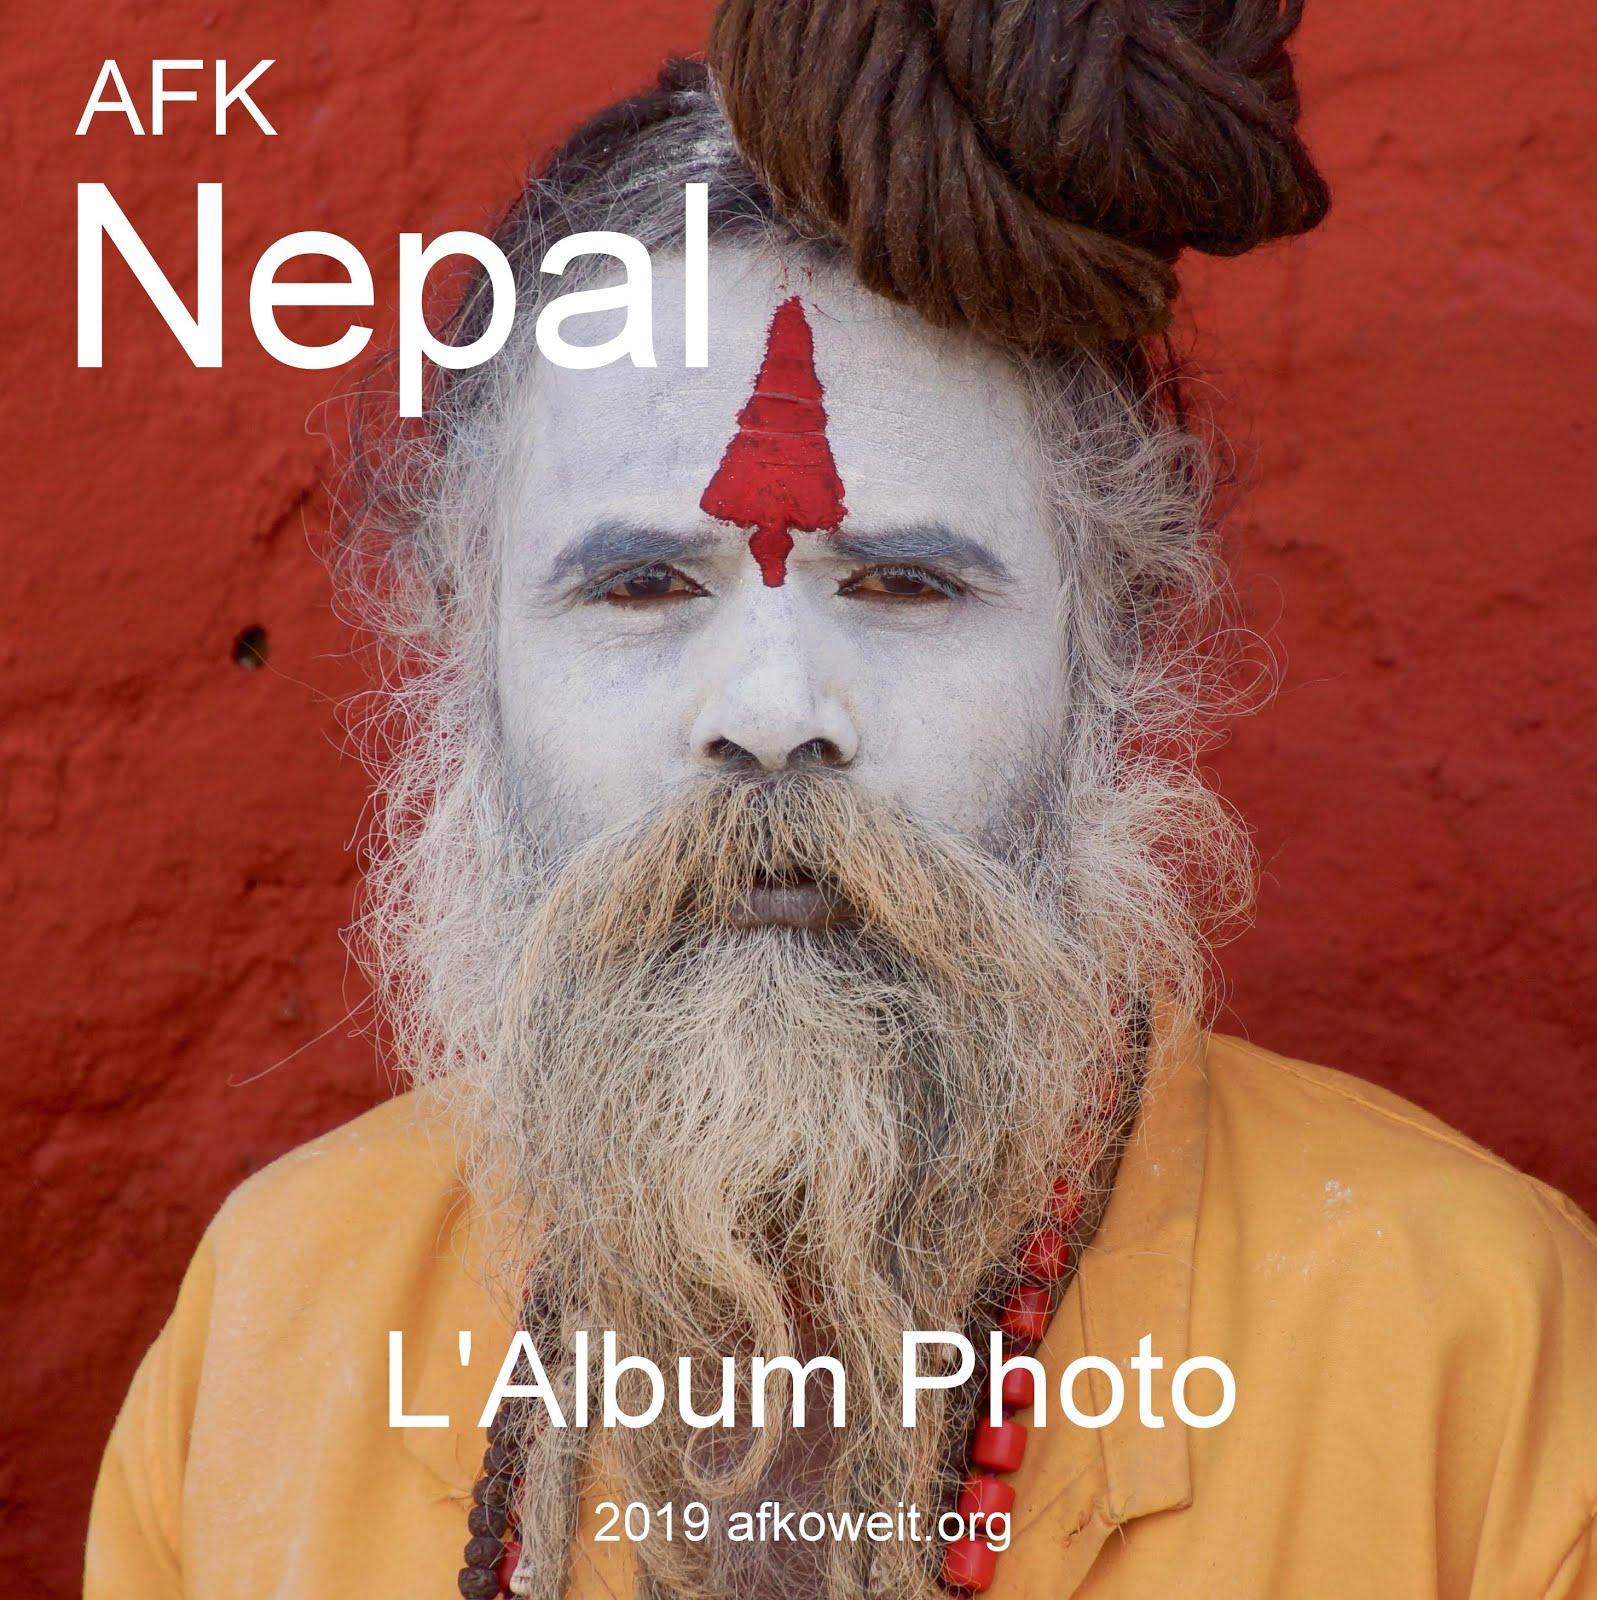 AFK NEPAL 2019